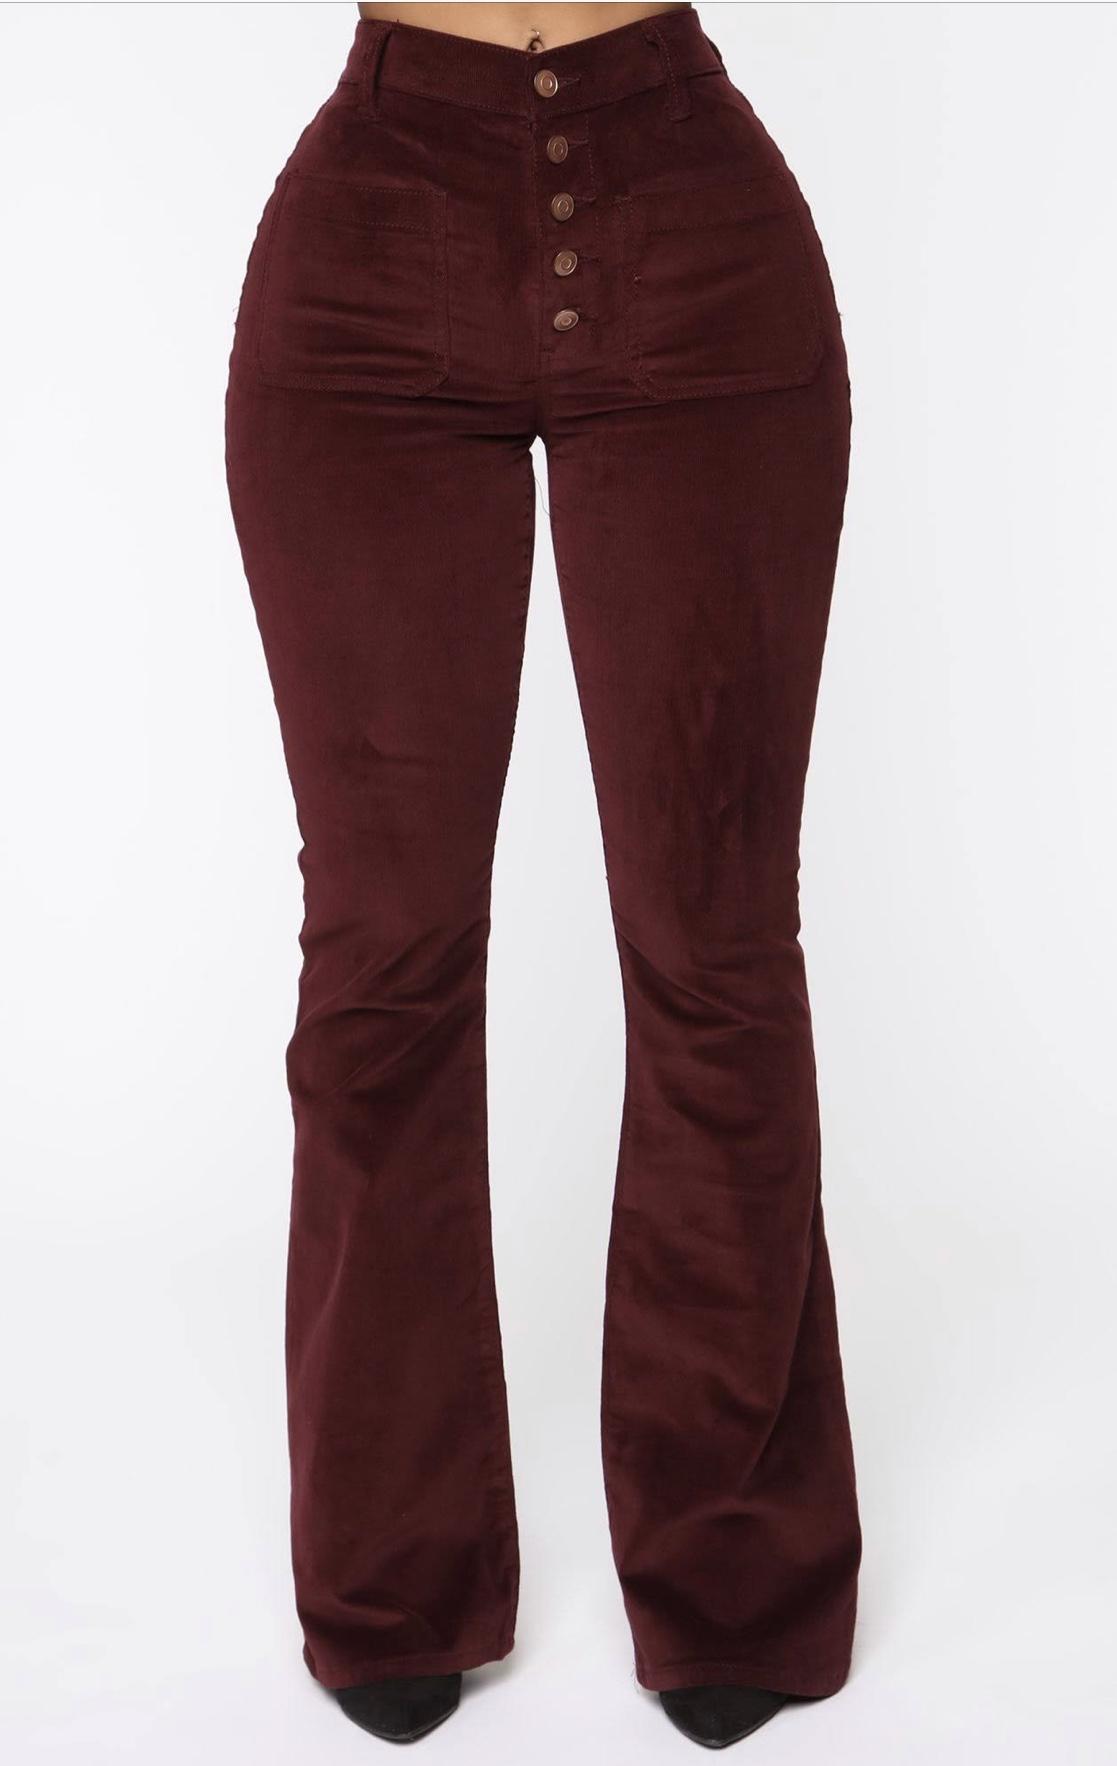 girl in jeans. fashion. corduroy. dope fashion sense. dopefashionsense